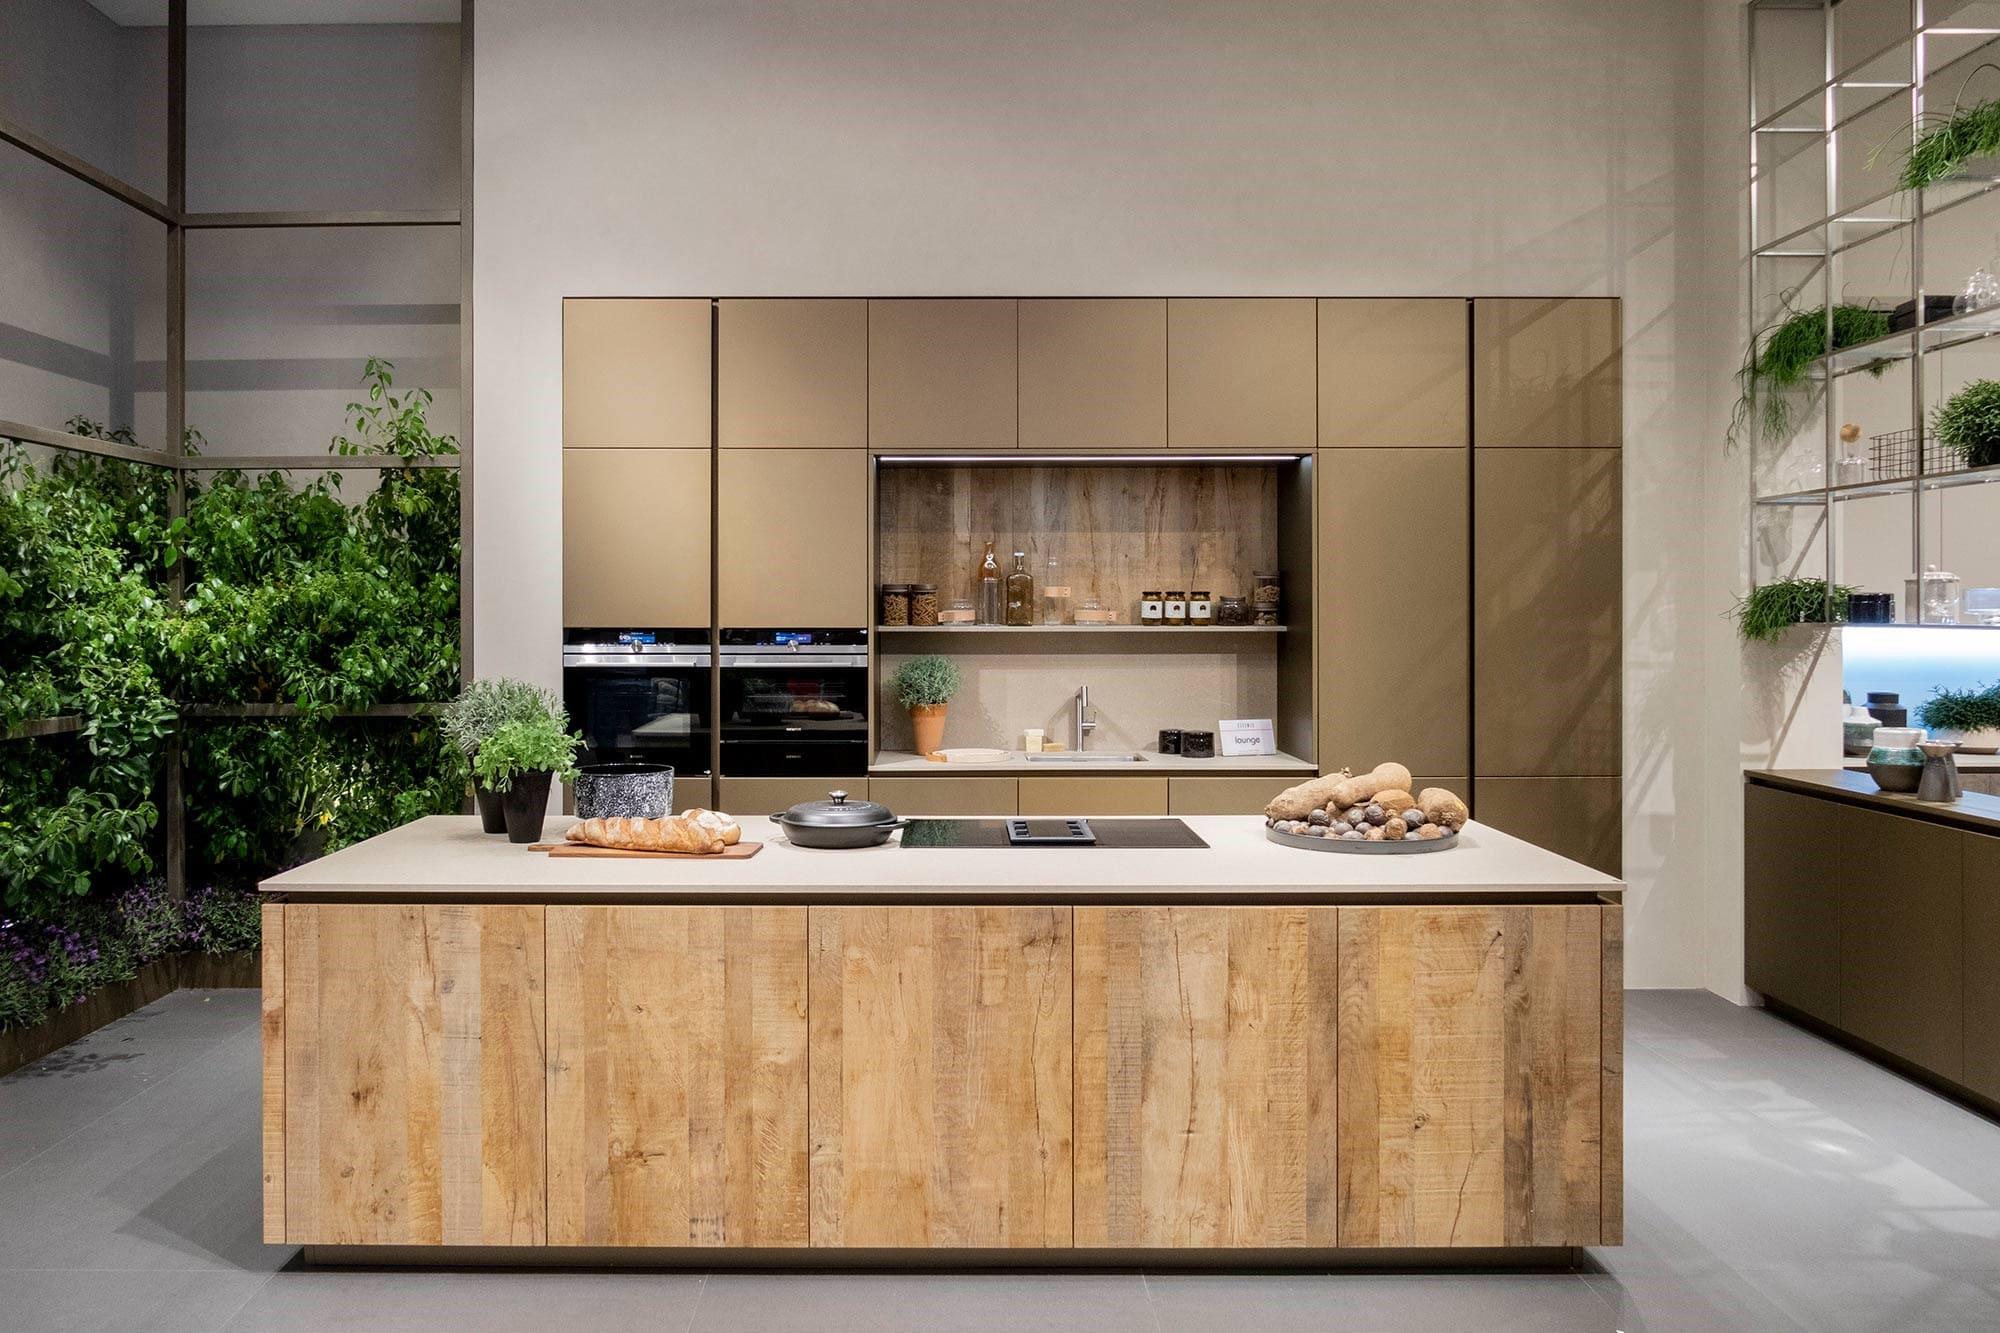 Kitchen Trends From Eurocucina 2018 In Milan